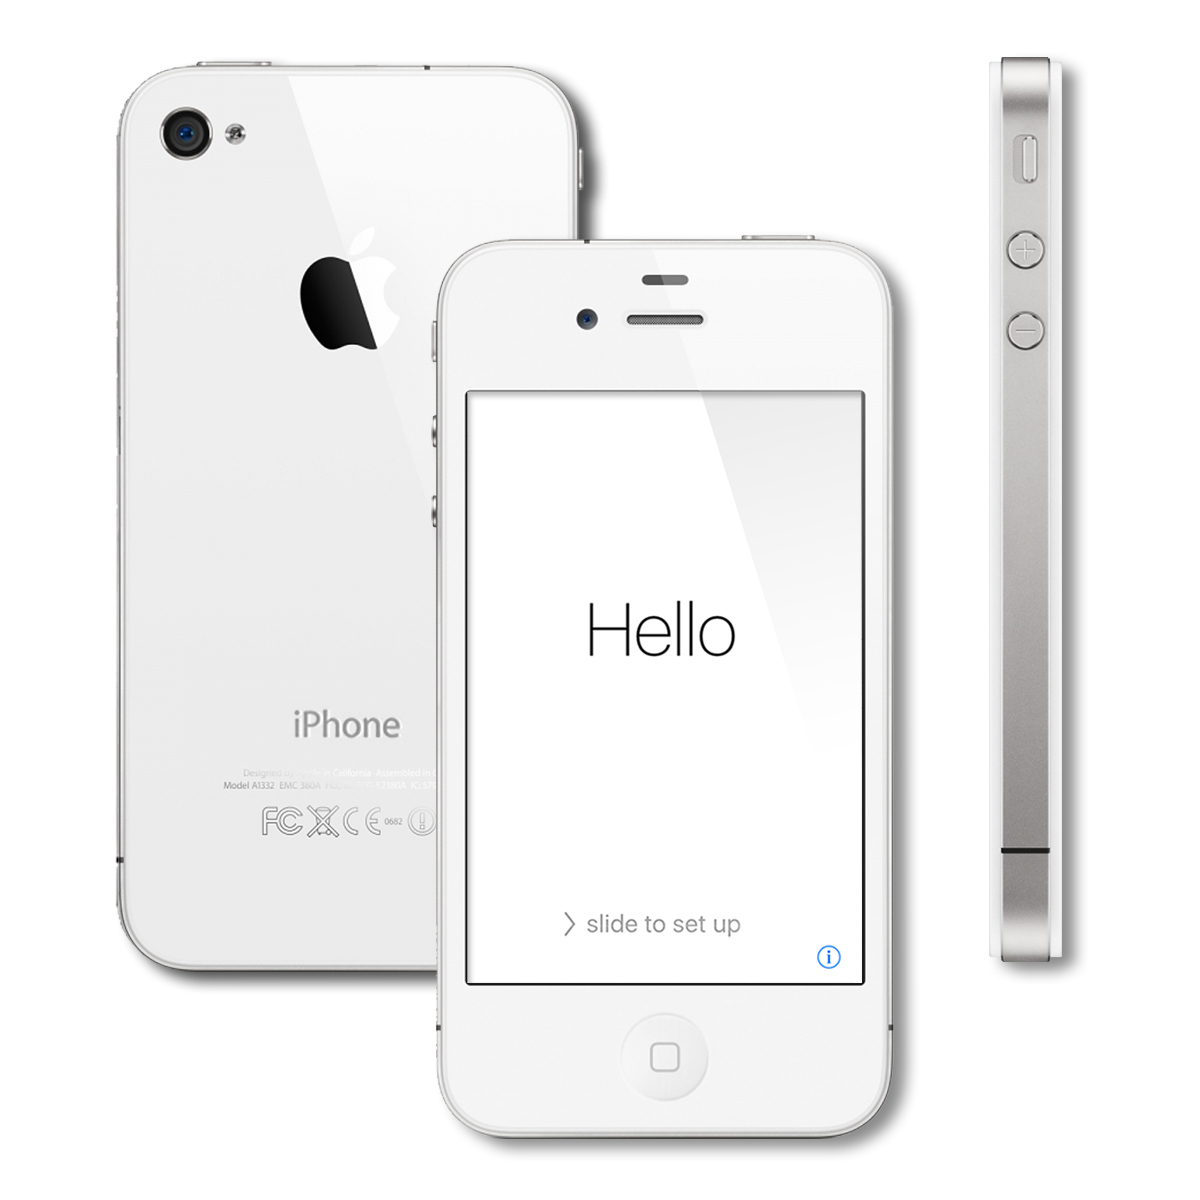 Iphone 4s 32gb deals 3